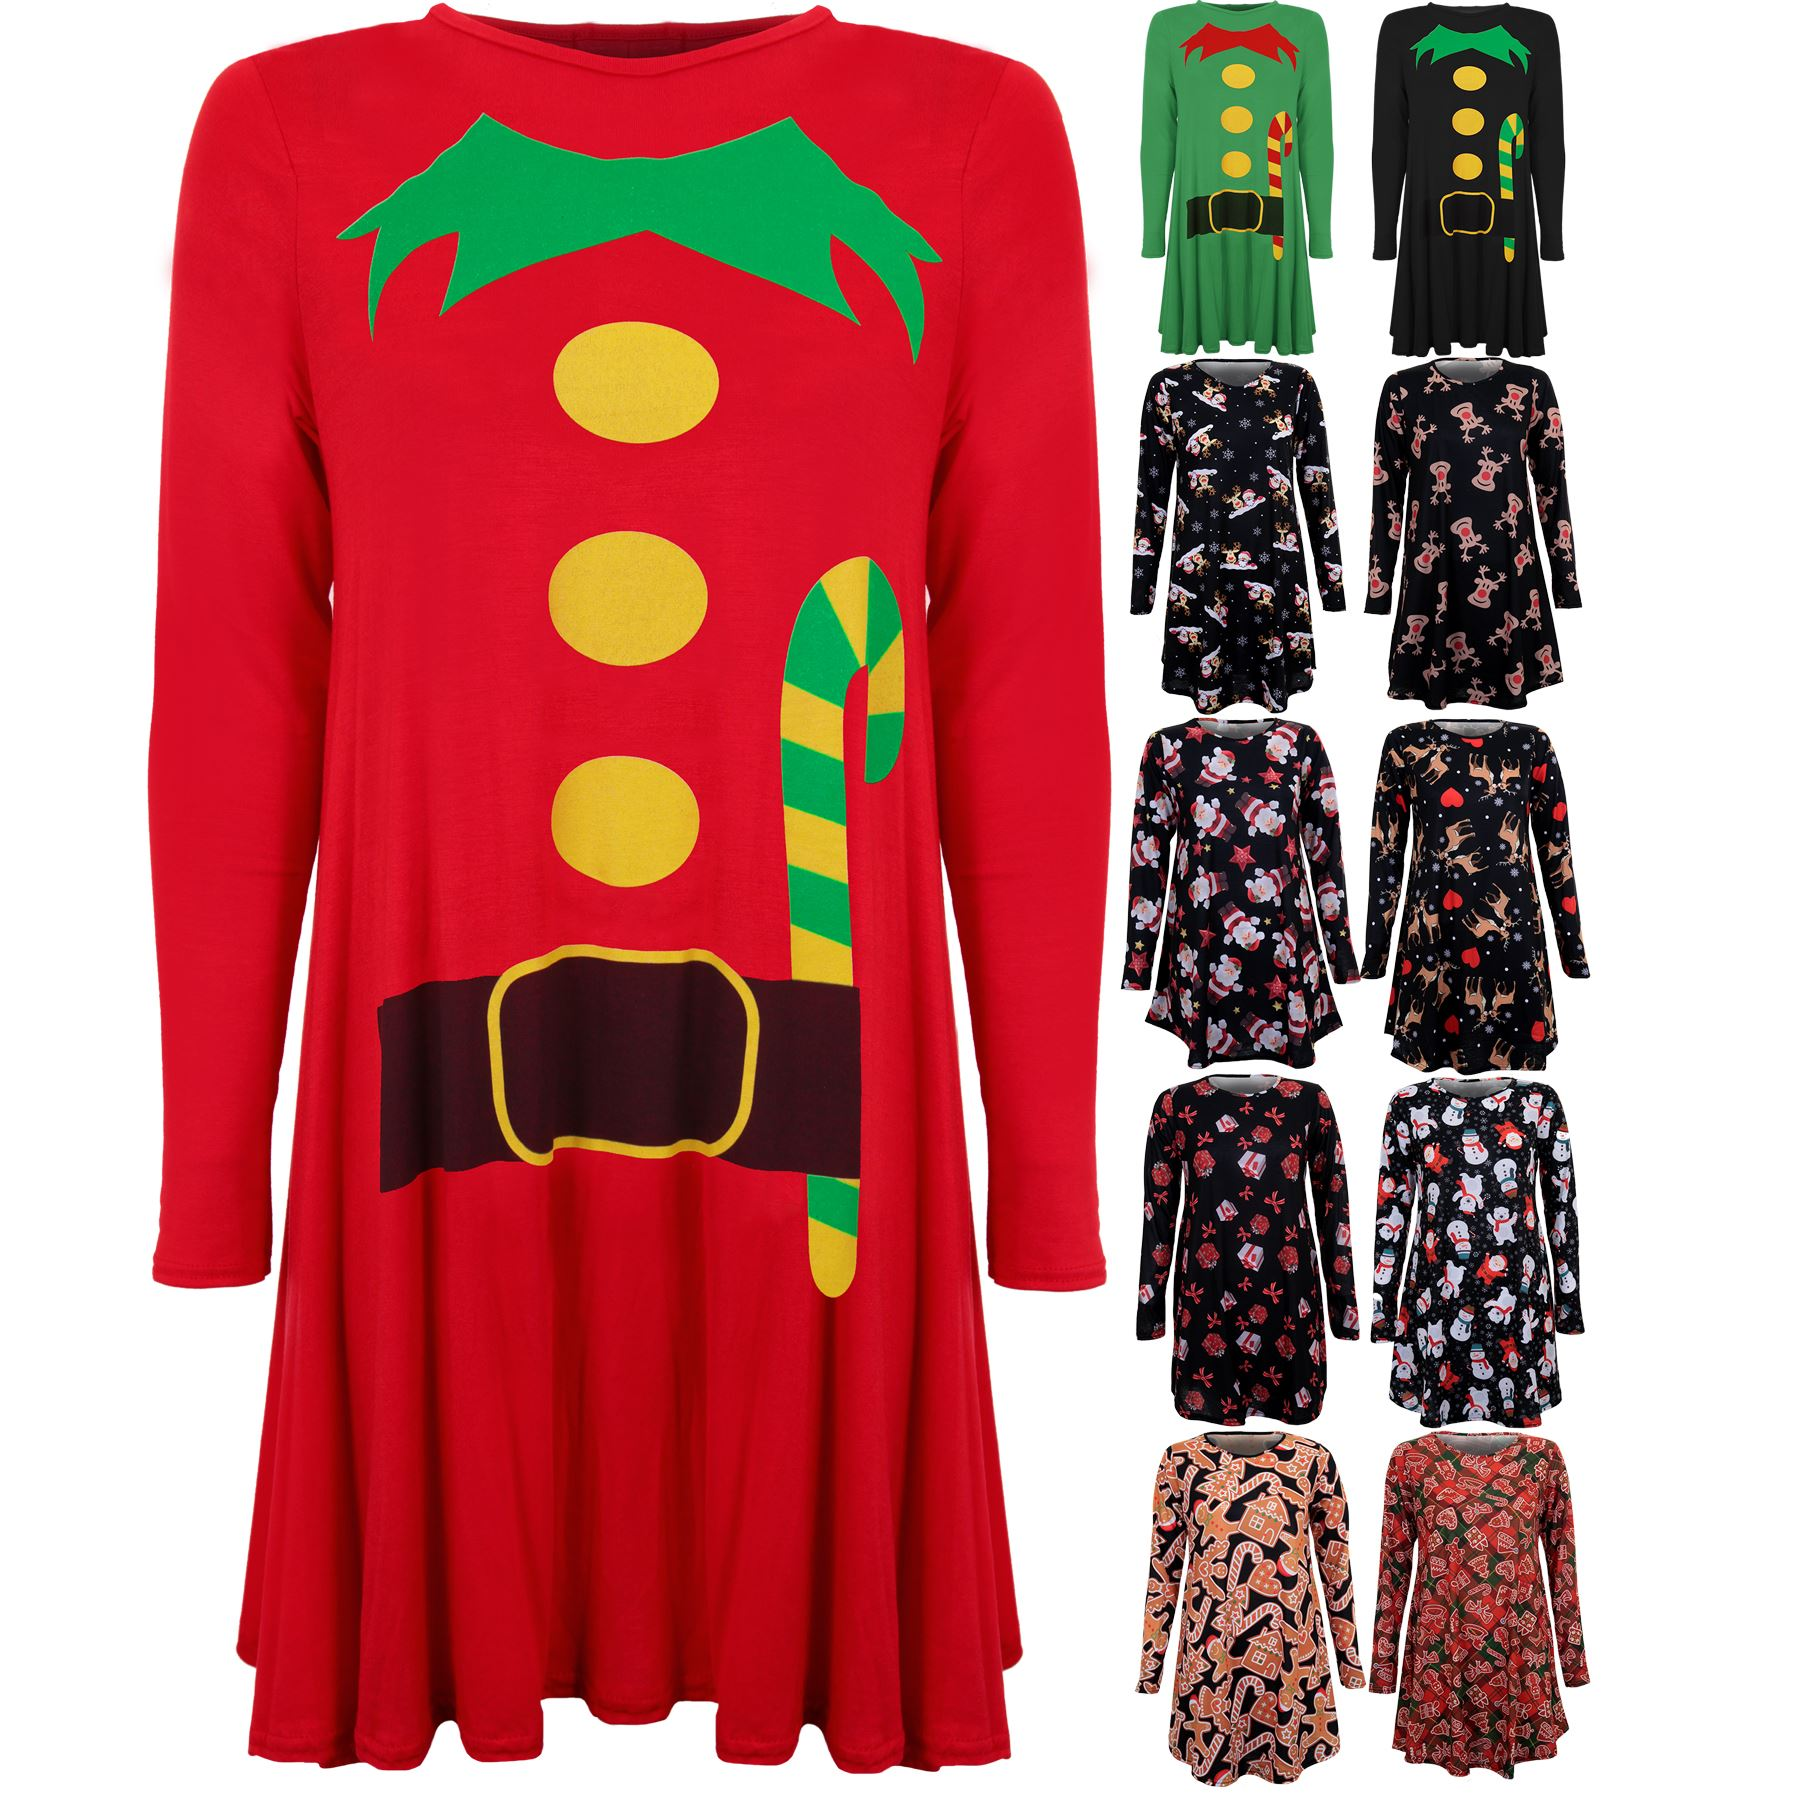 Details about Ladies Flared Skater Snowman Santa Reindeer Elf Suit  Christmas Dress Plus Size